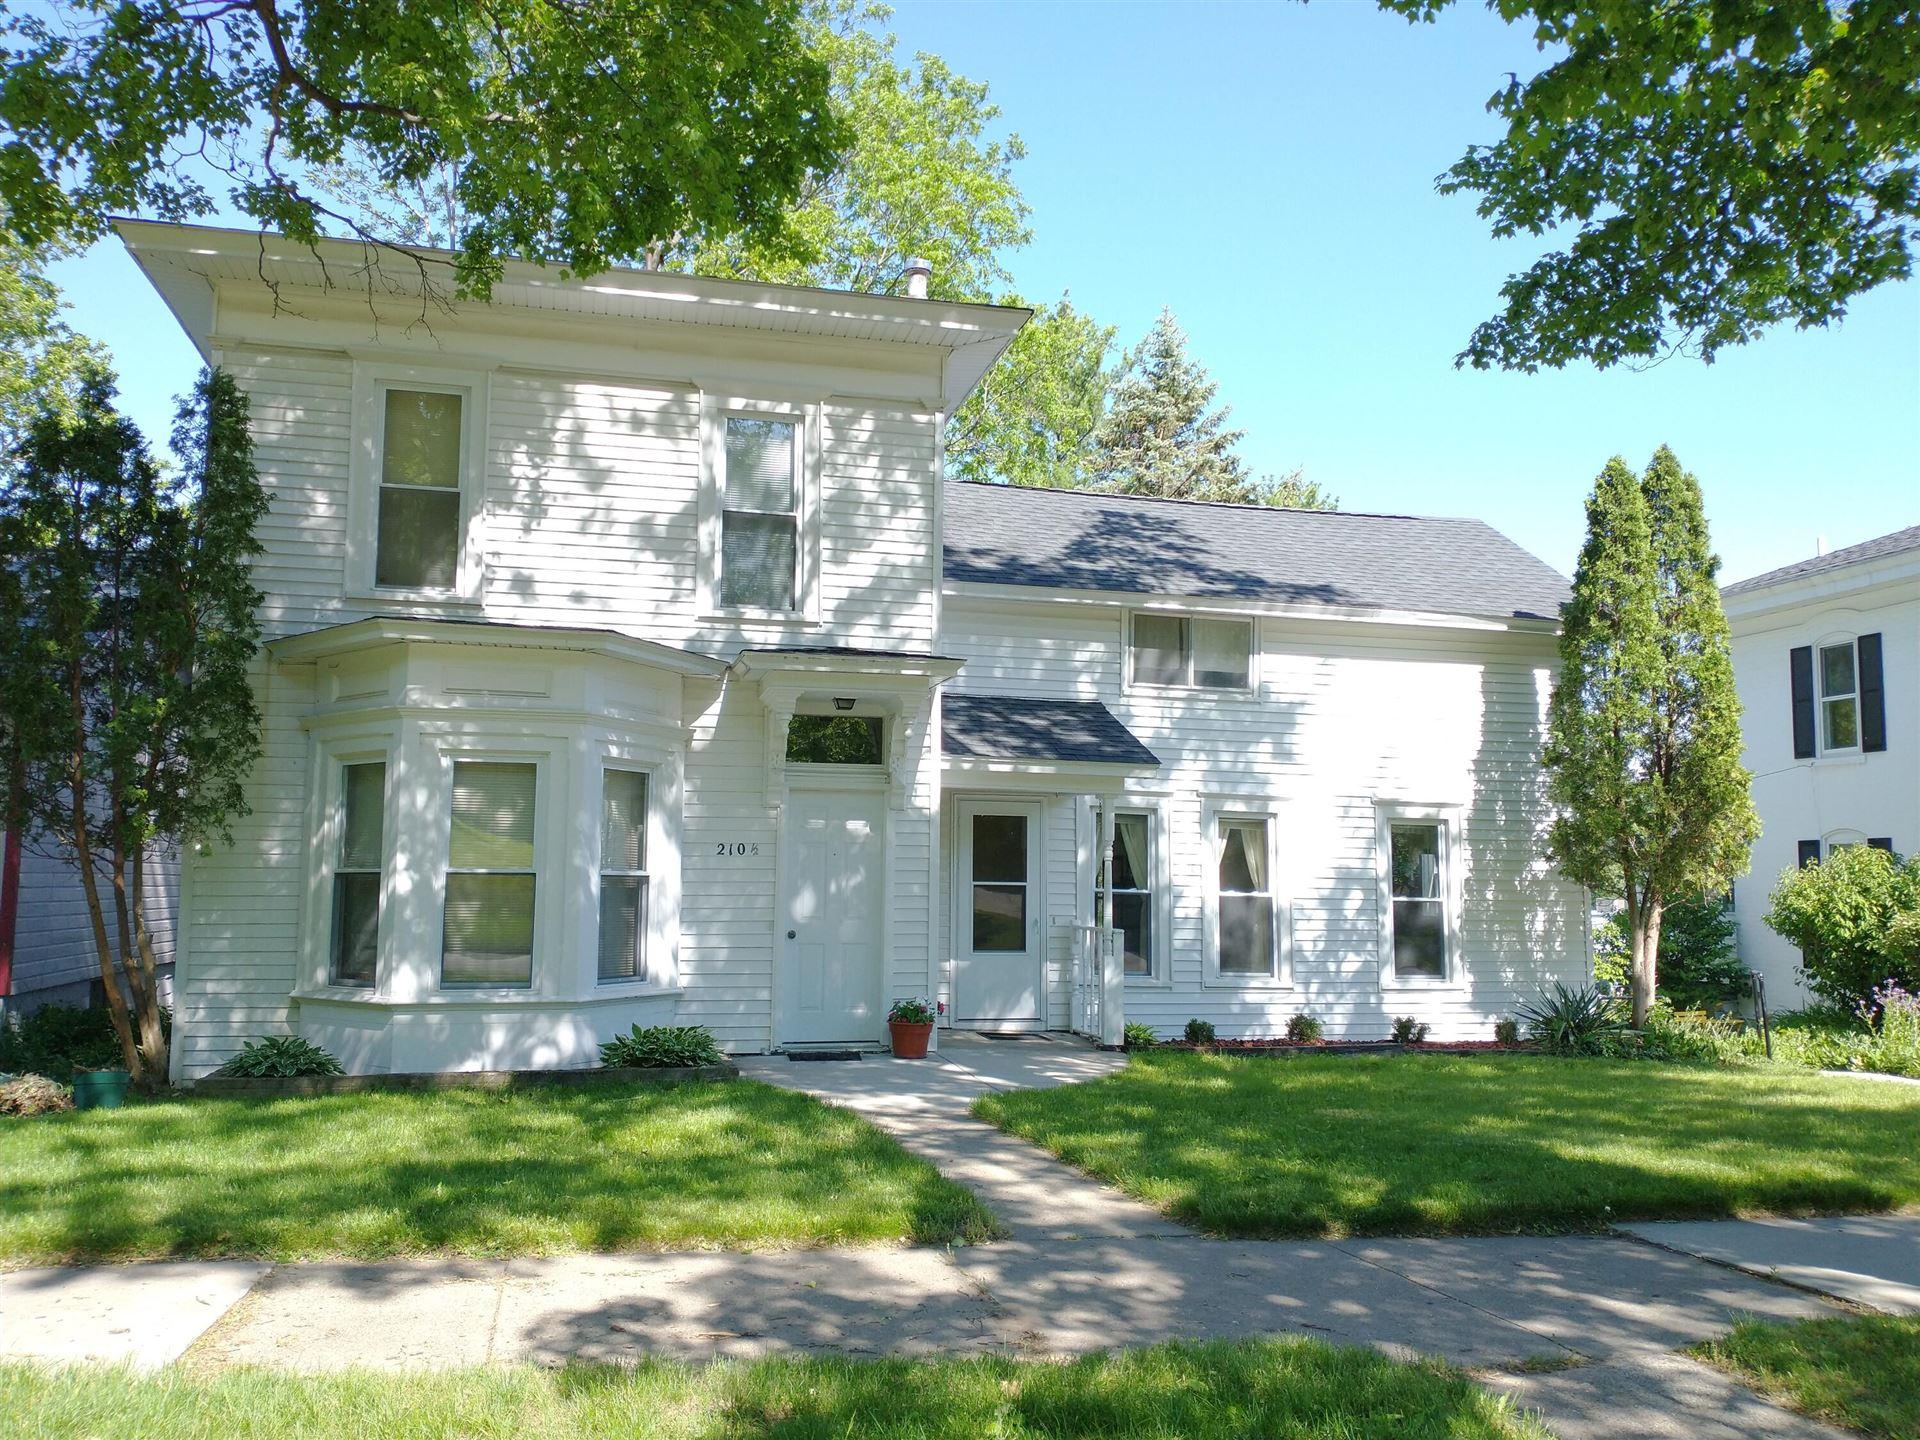 210 Rose Avenue, Big Rapids, MI 49307 - MLS#: 21021828